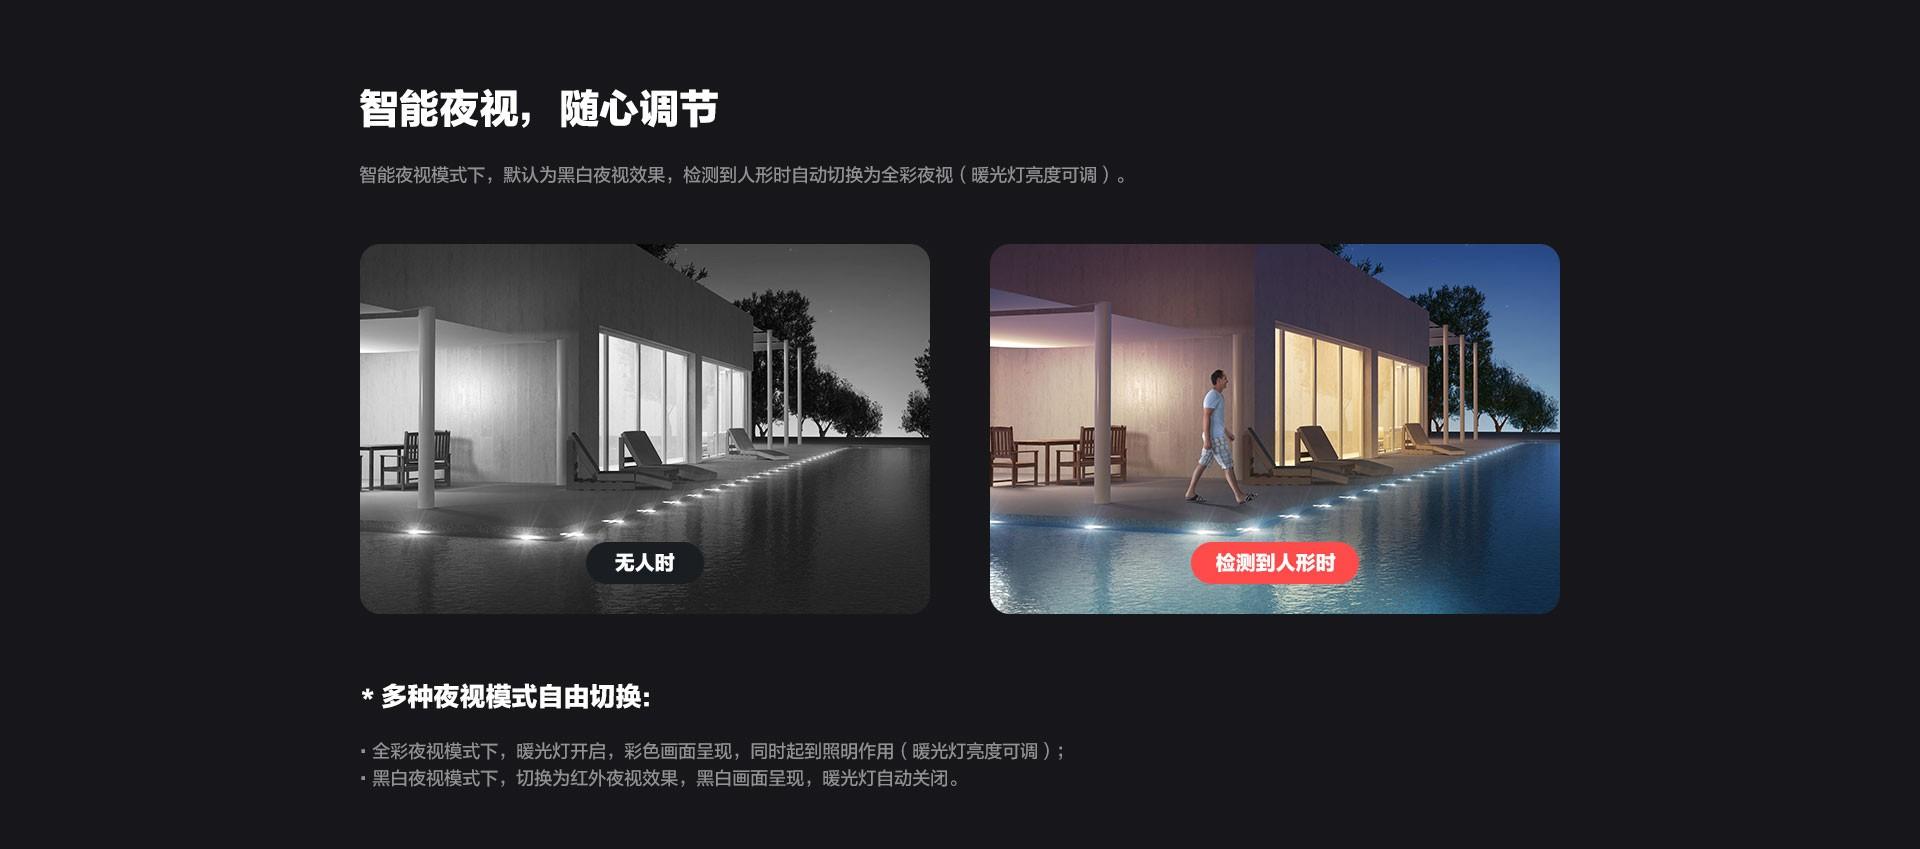 C3-Ai-web_12.jpg